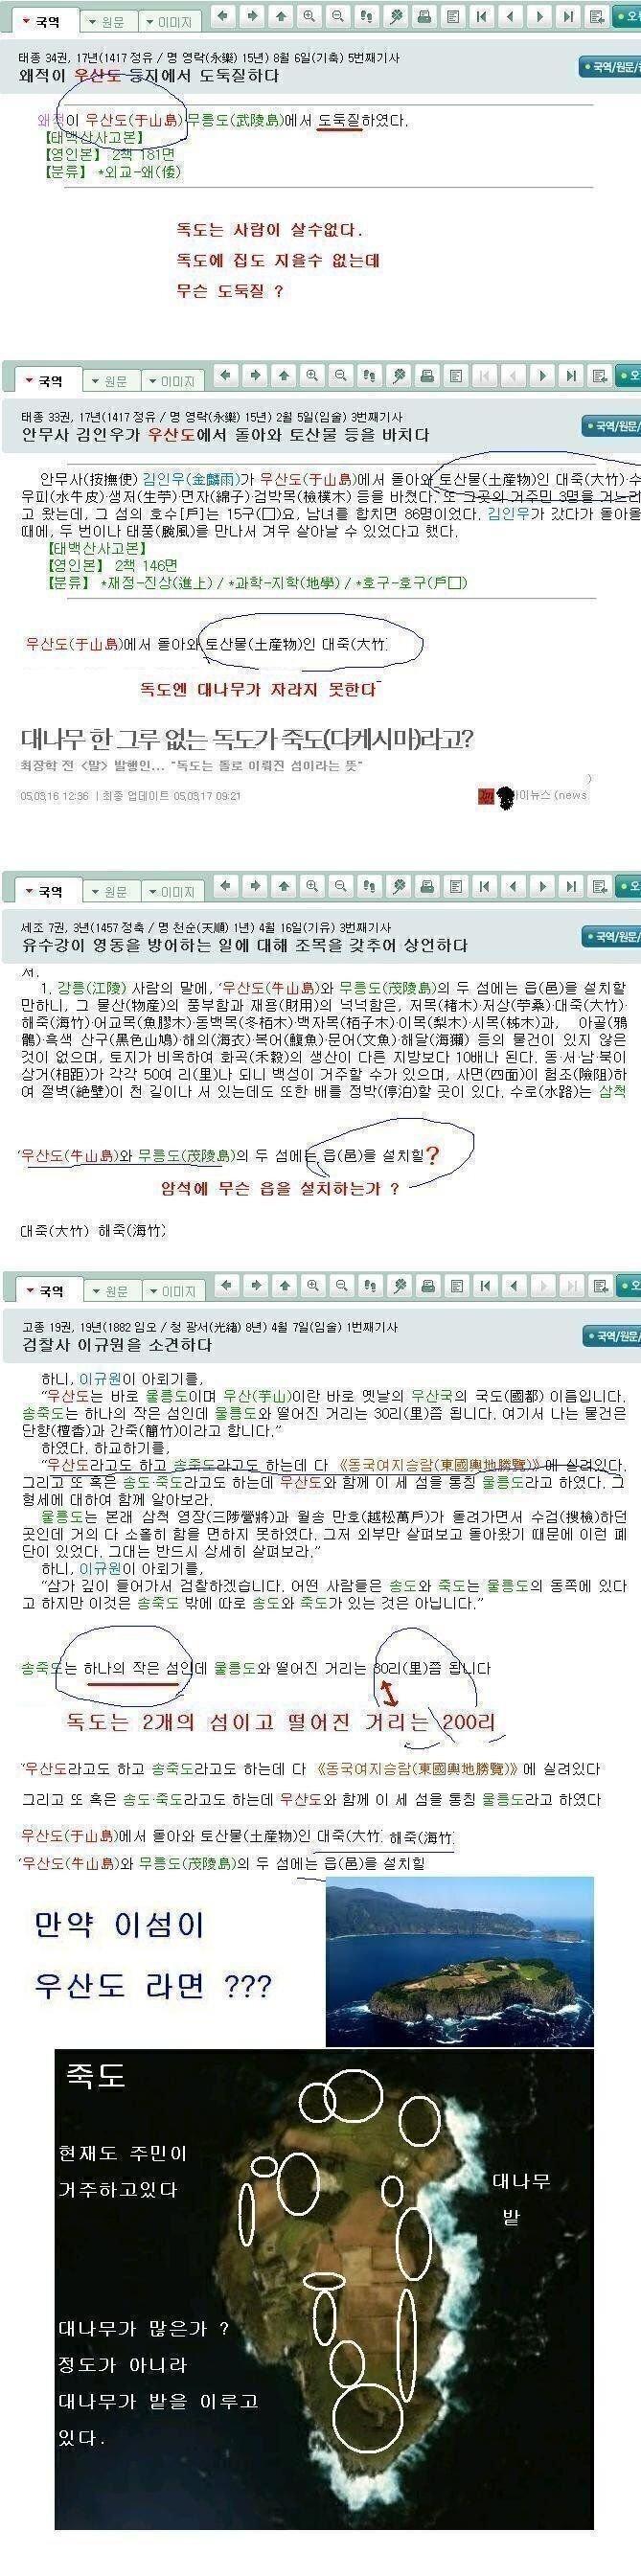 viewimage.php?id=25b8dc2aeedd2aa36f&no=24b0d769e1d32ca73ceb86fa11d02831eebc6c37c2fa034916fac403212605e232f5d7a914f2d63e0215e5c1b5c19ffff77d7eda1faba95e98b7debd9f8cedbec638b79d376c96523aa89b4792